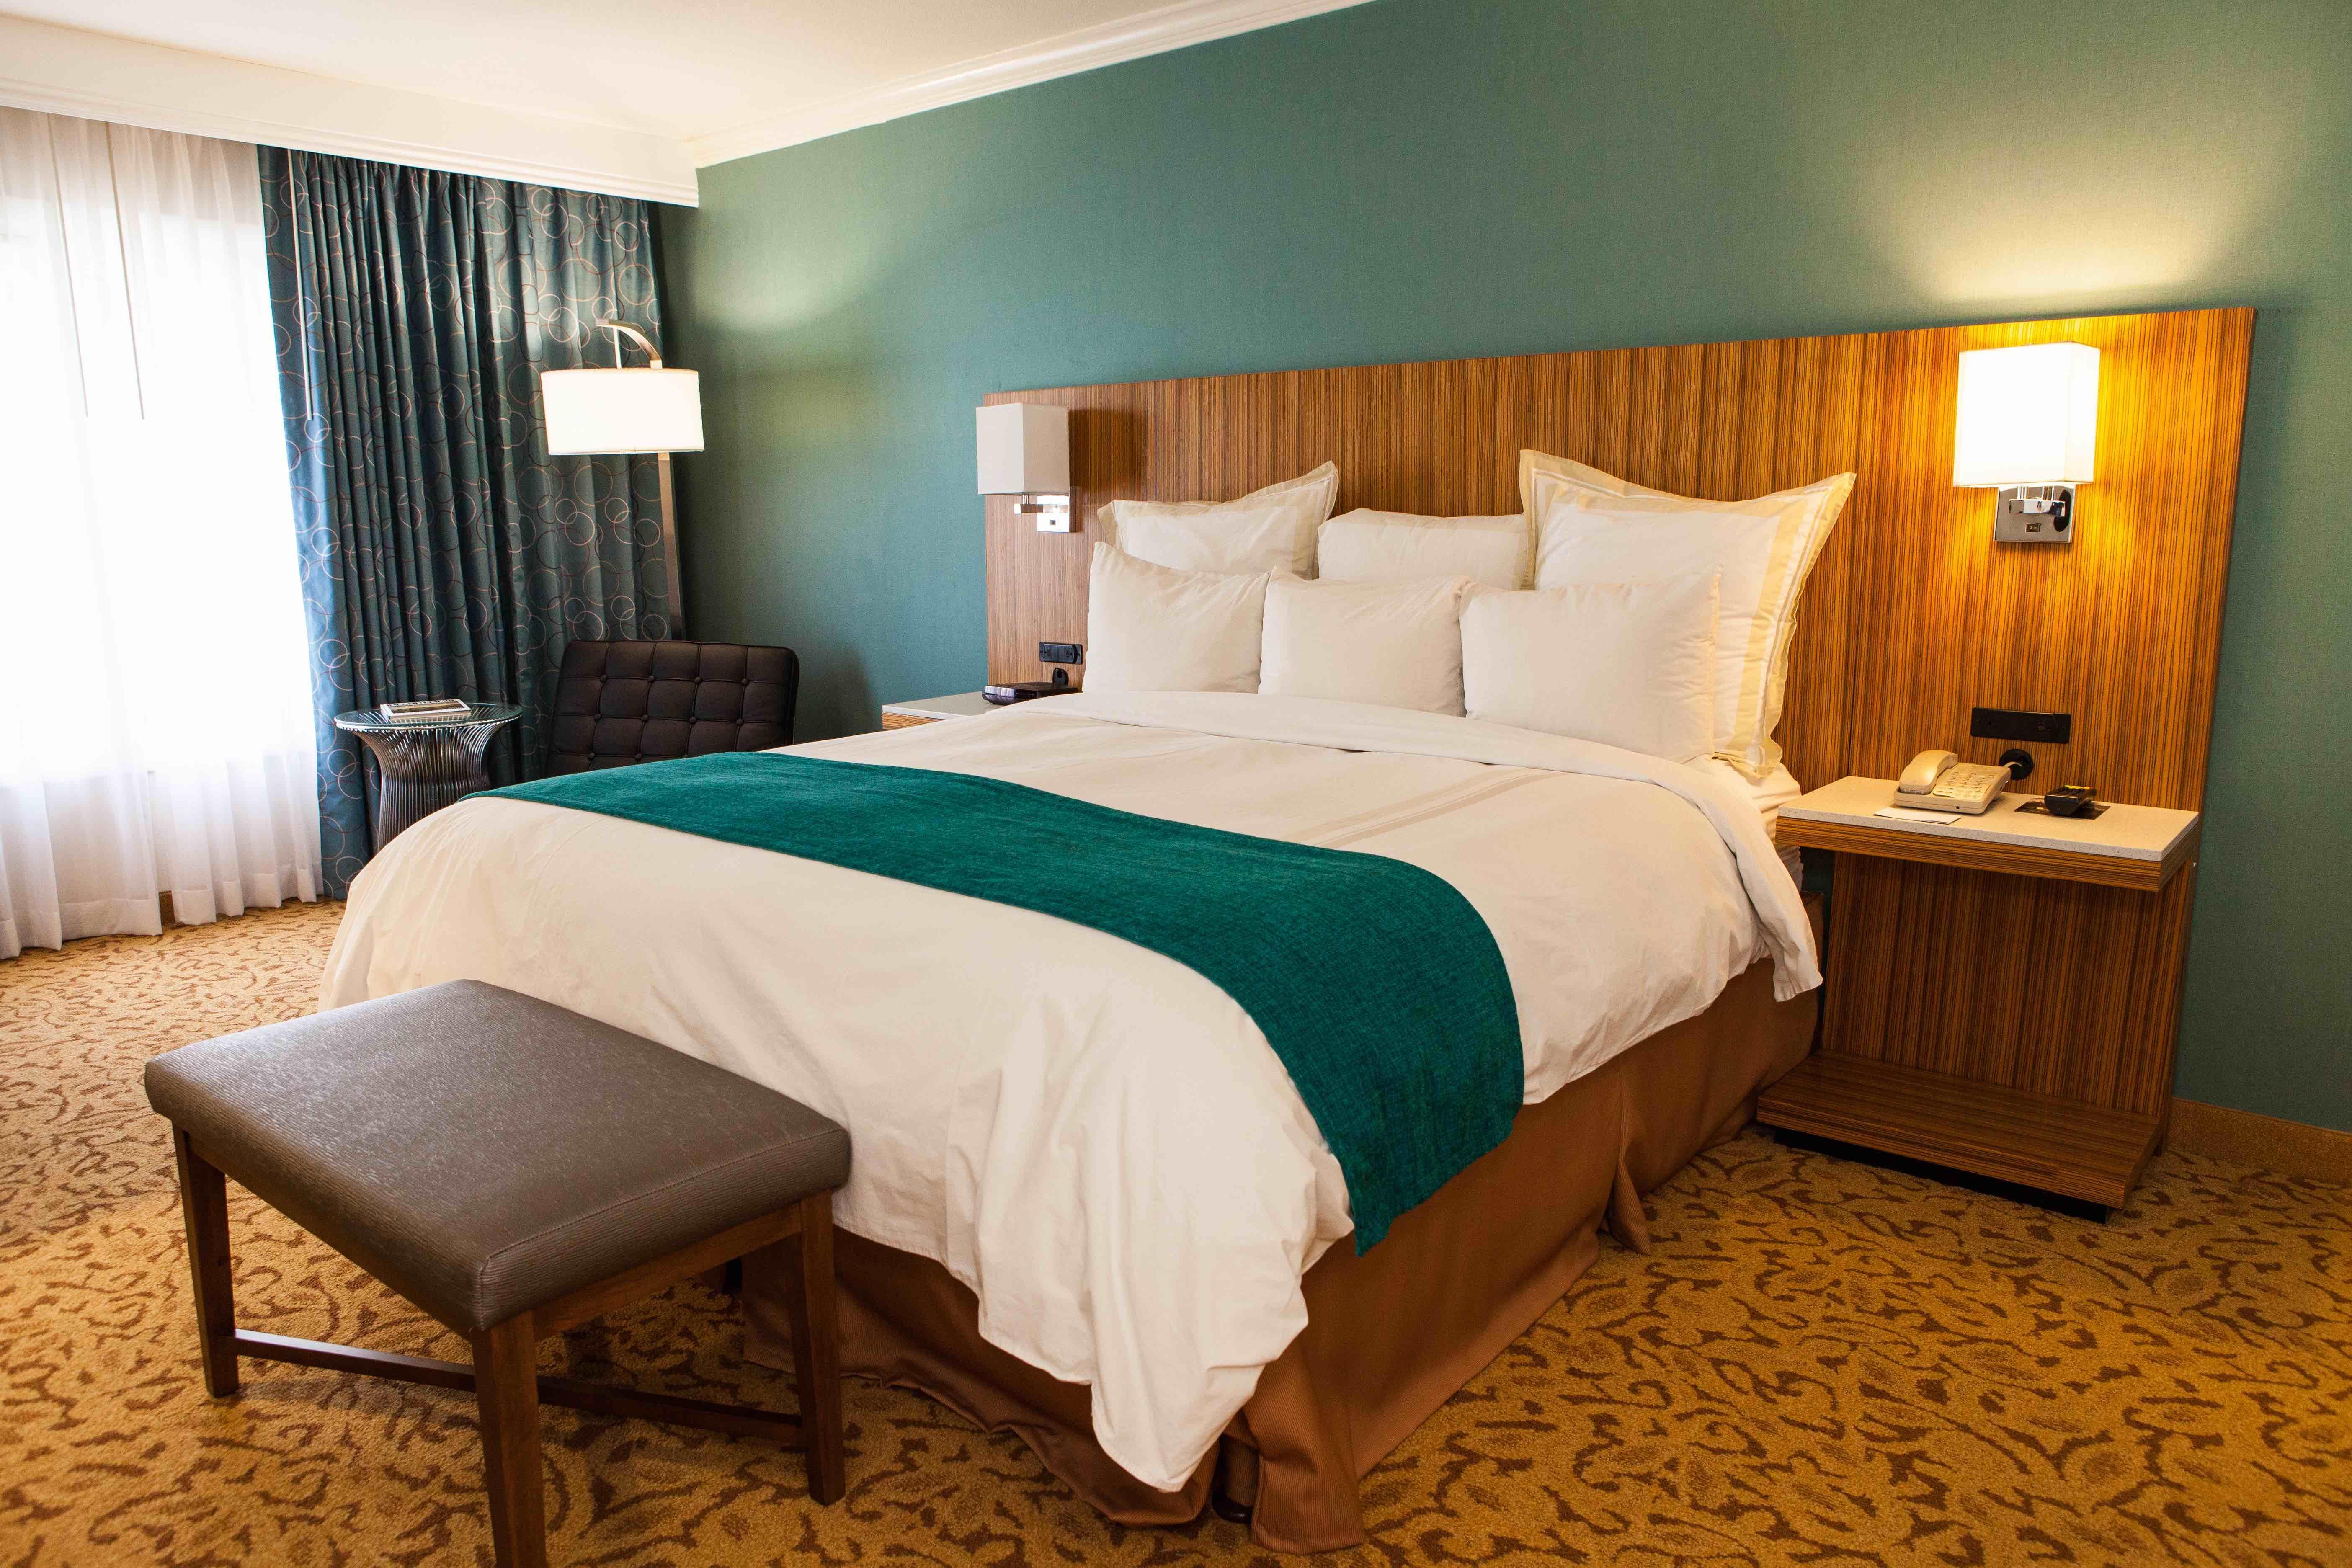 ontario gateway hotel in ontario ca 91761. Black Bedroom Furniture Sets. Home Design Ideas